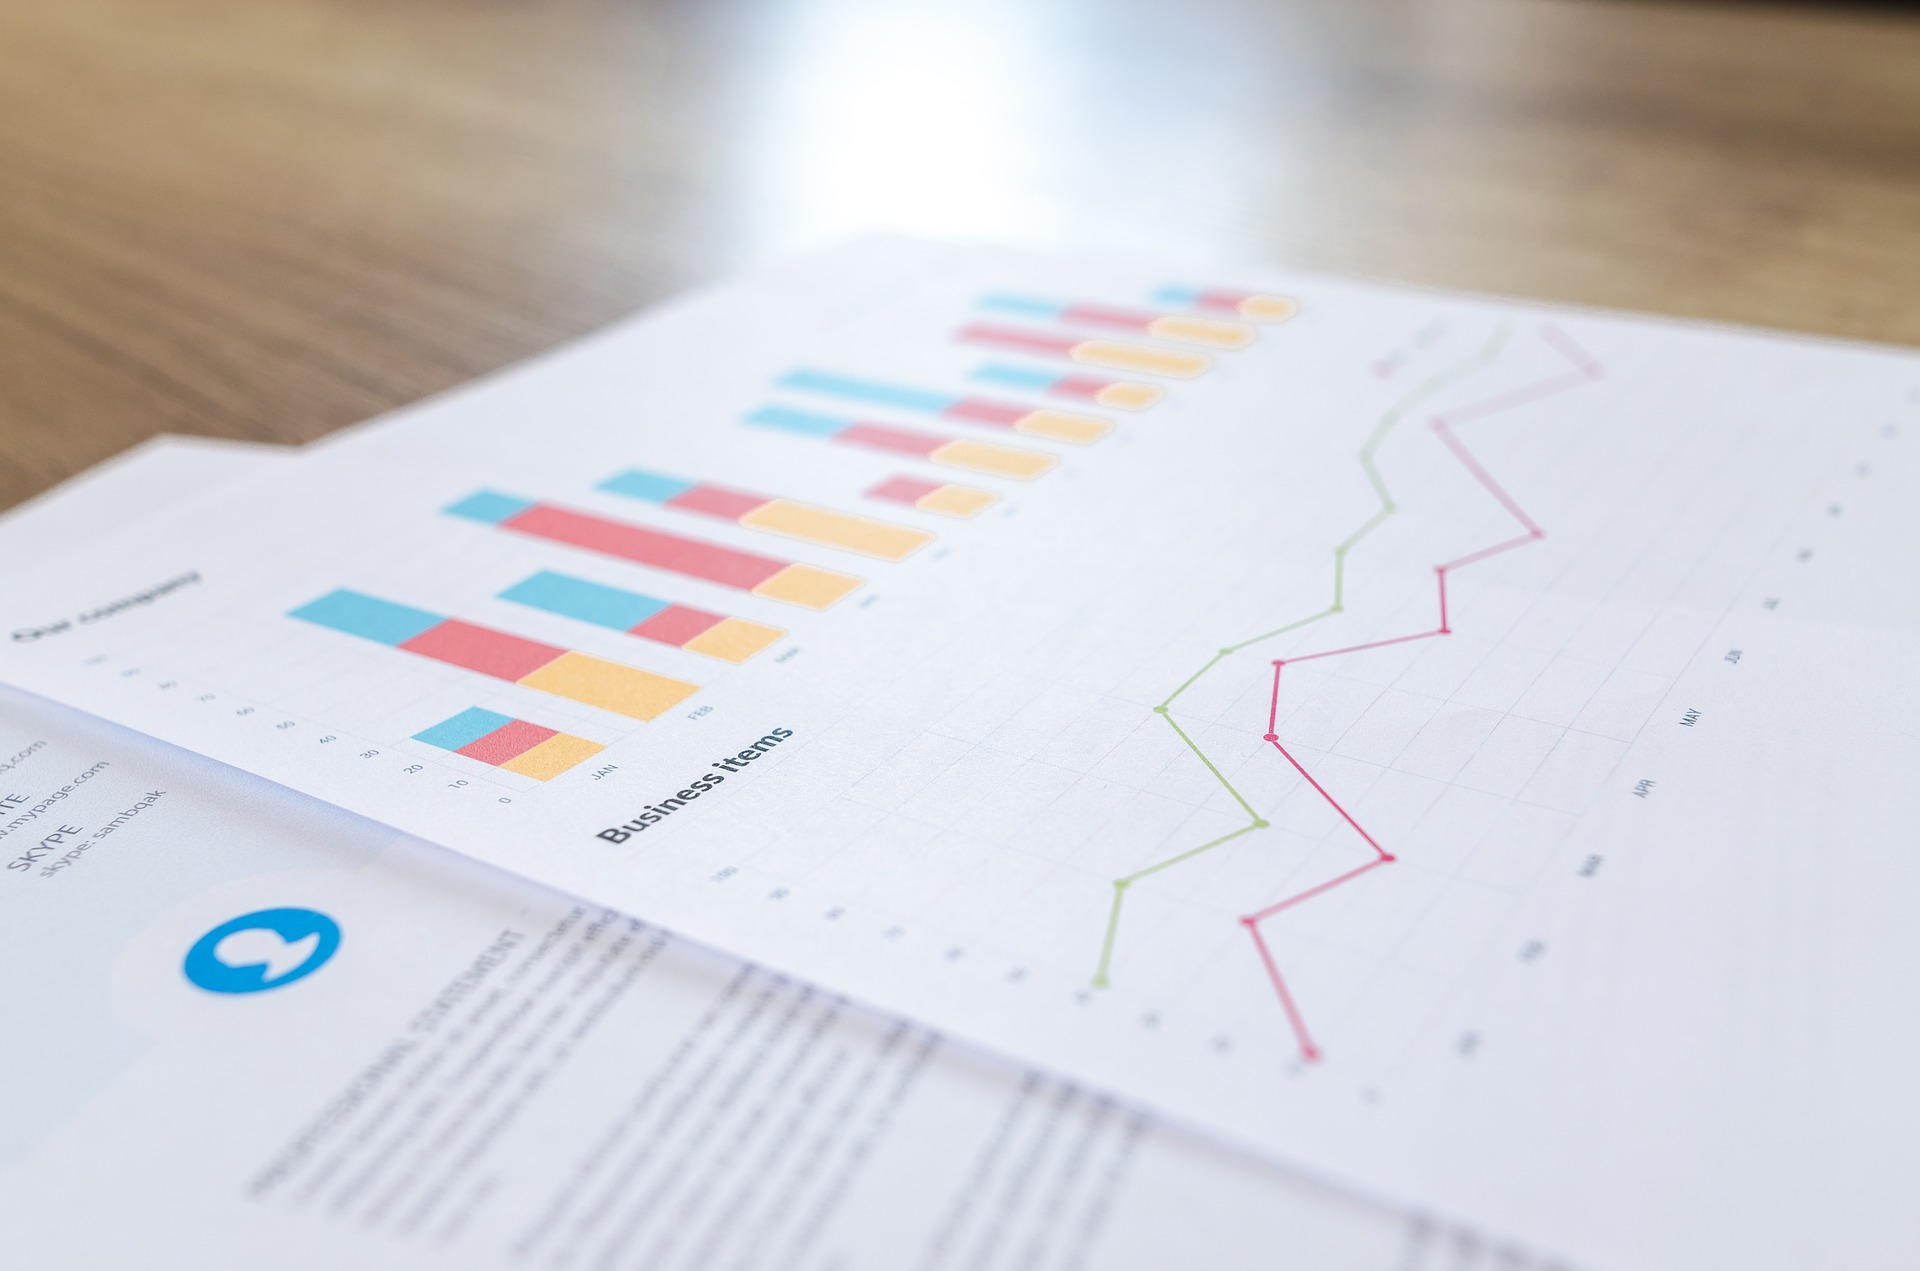 Predicting Car Prices using Multivariate Linear Regression